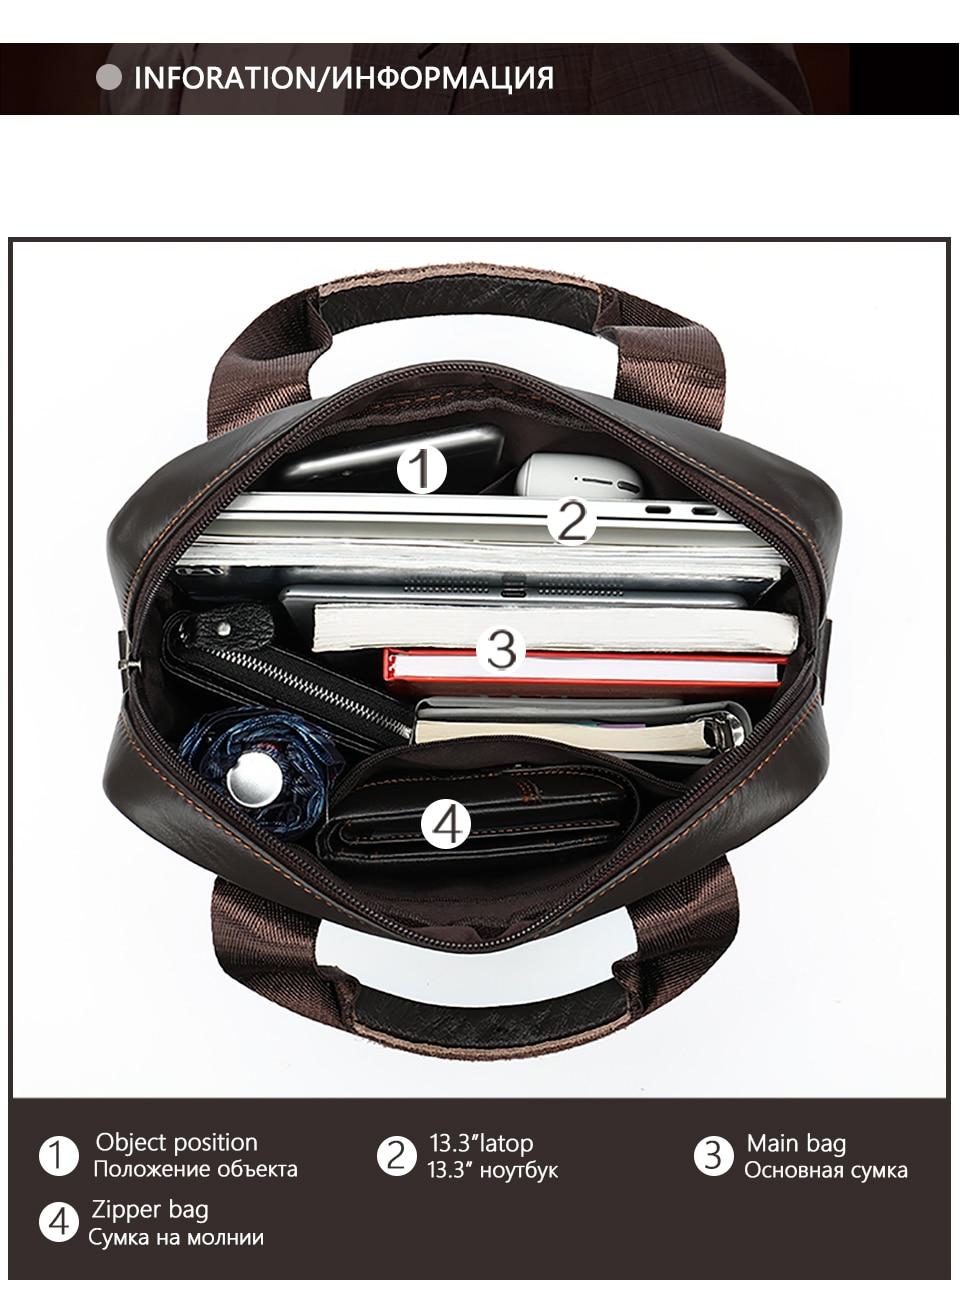 HTB1SCaQbUCF3KVjSZJnq6znHFXaJ MVA genuine leather men's bag messenger bag men leather crossbody bags for men handbag business men's laptop/shoulder bag 8568